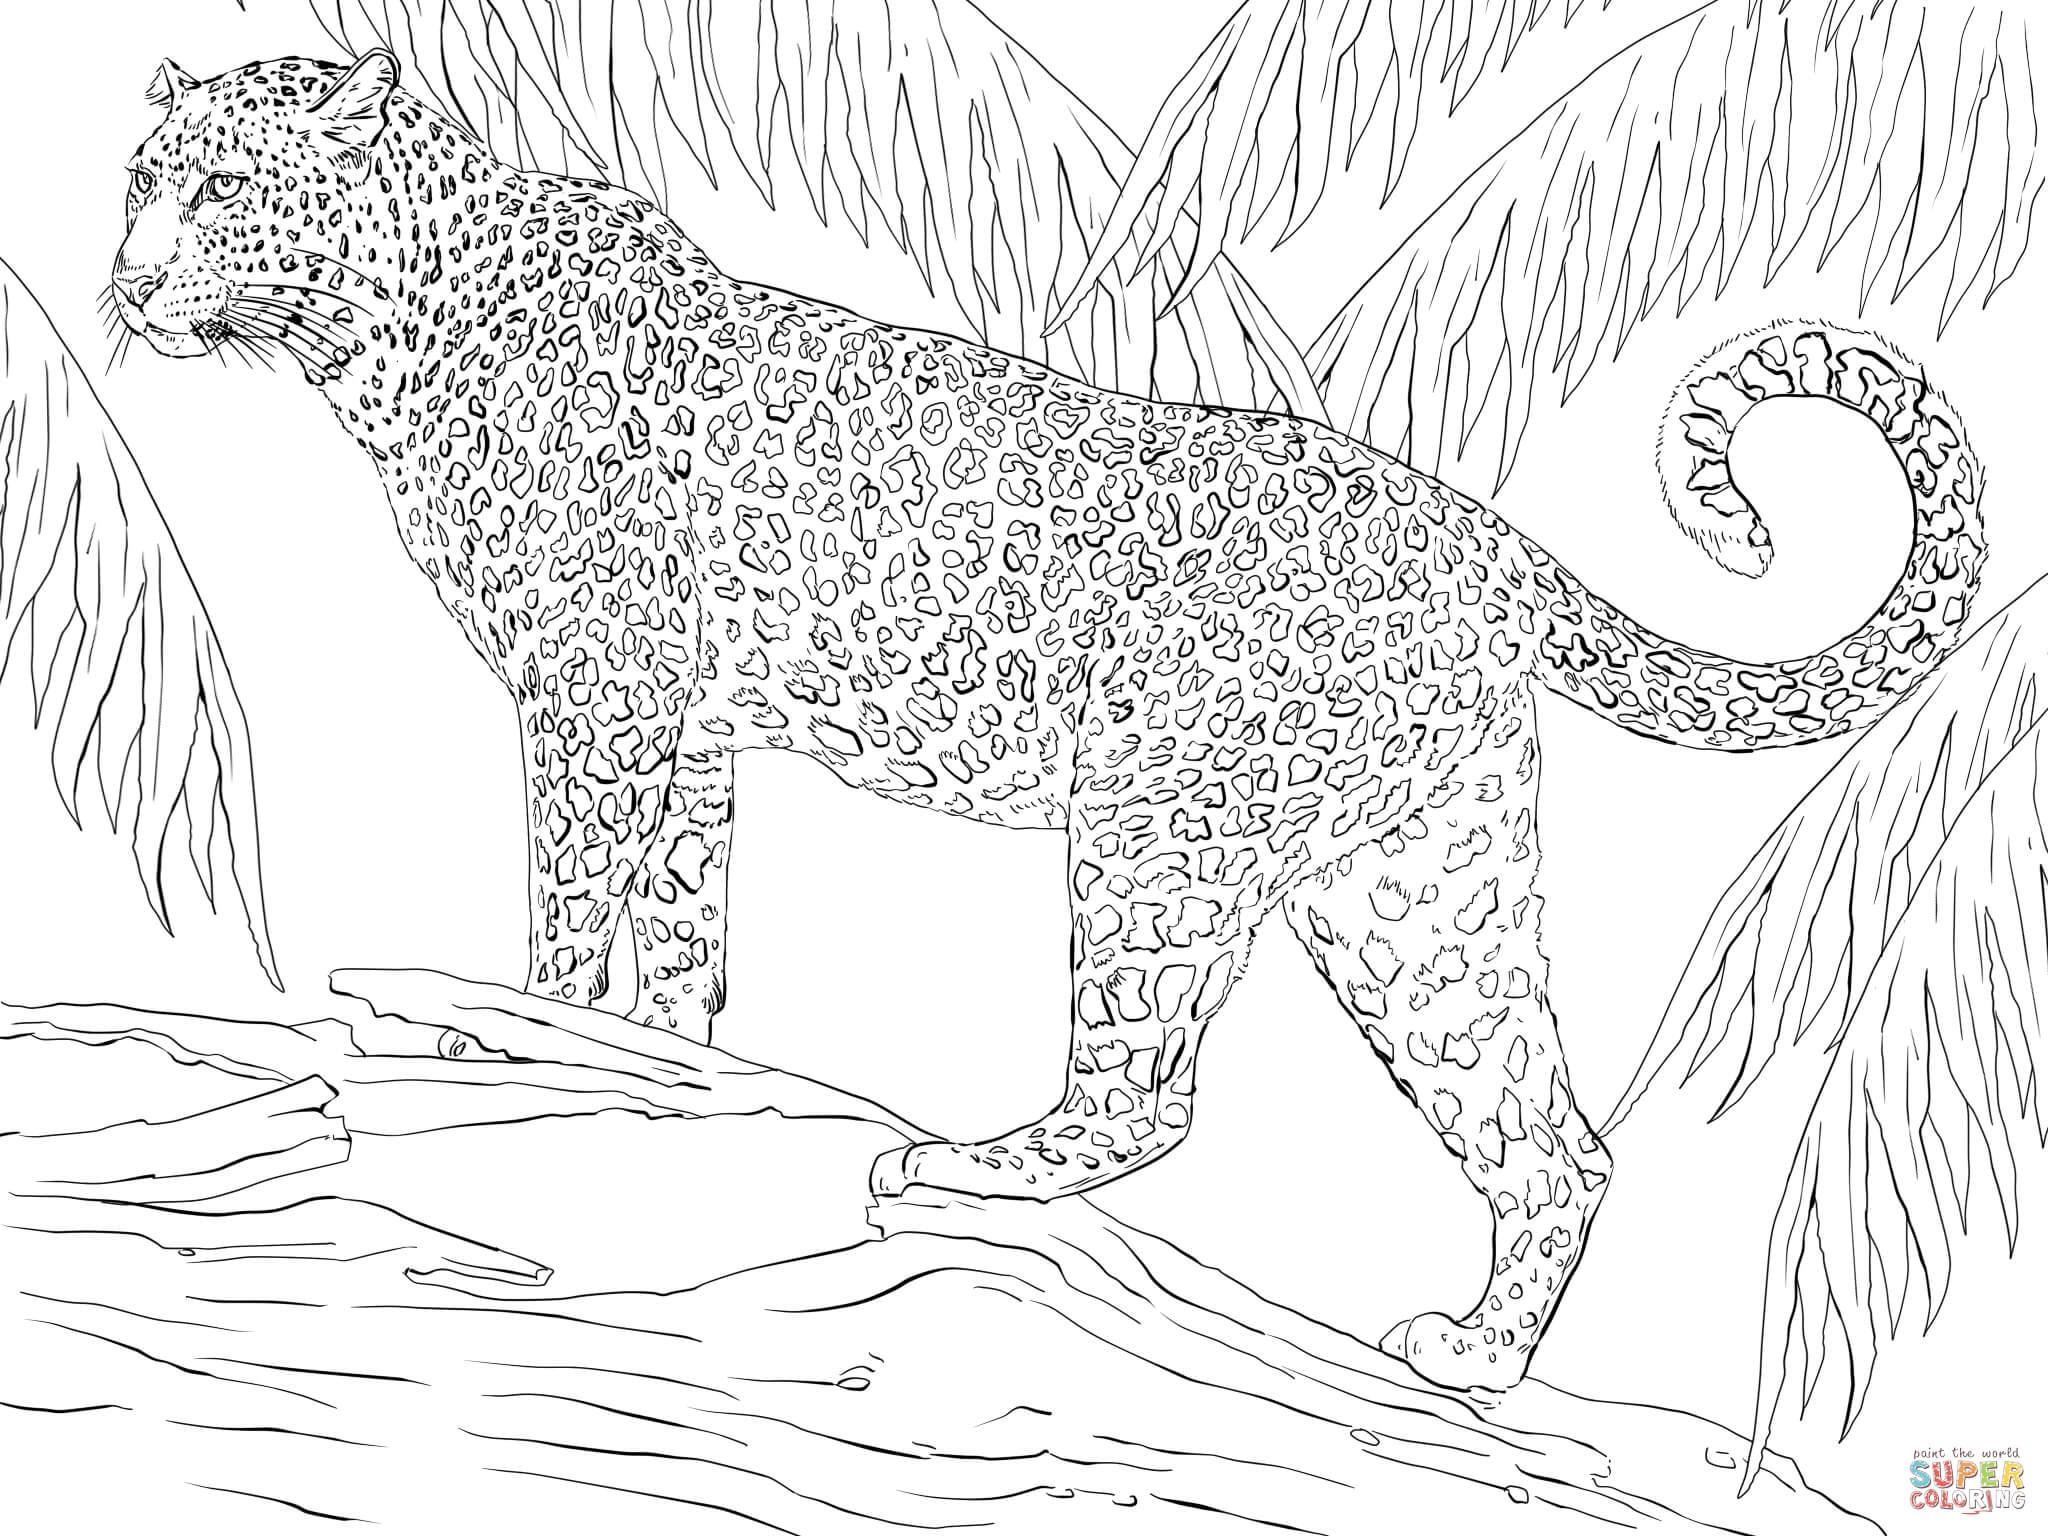 2048x1536 Coloring Pages Of Animal Footprints Copy Jaguar Coloring Page